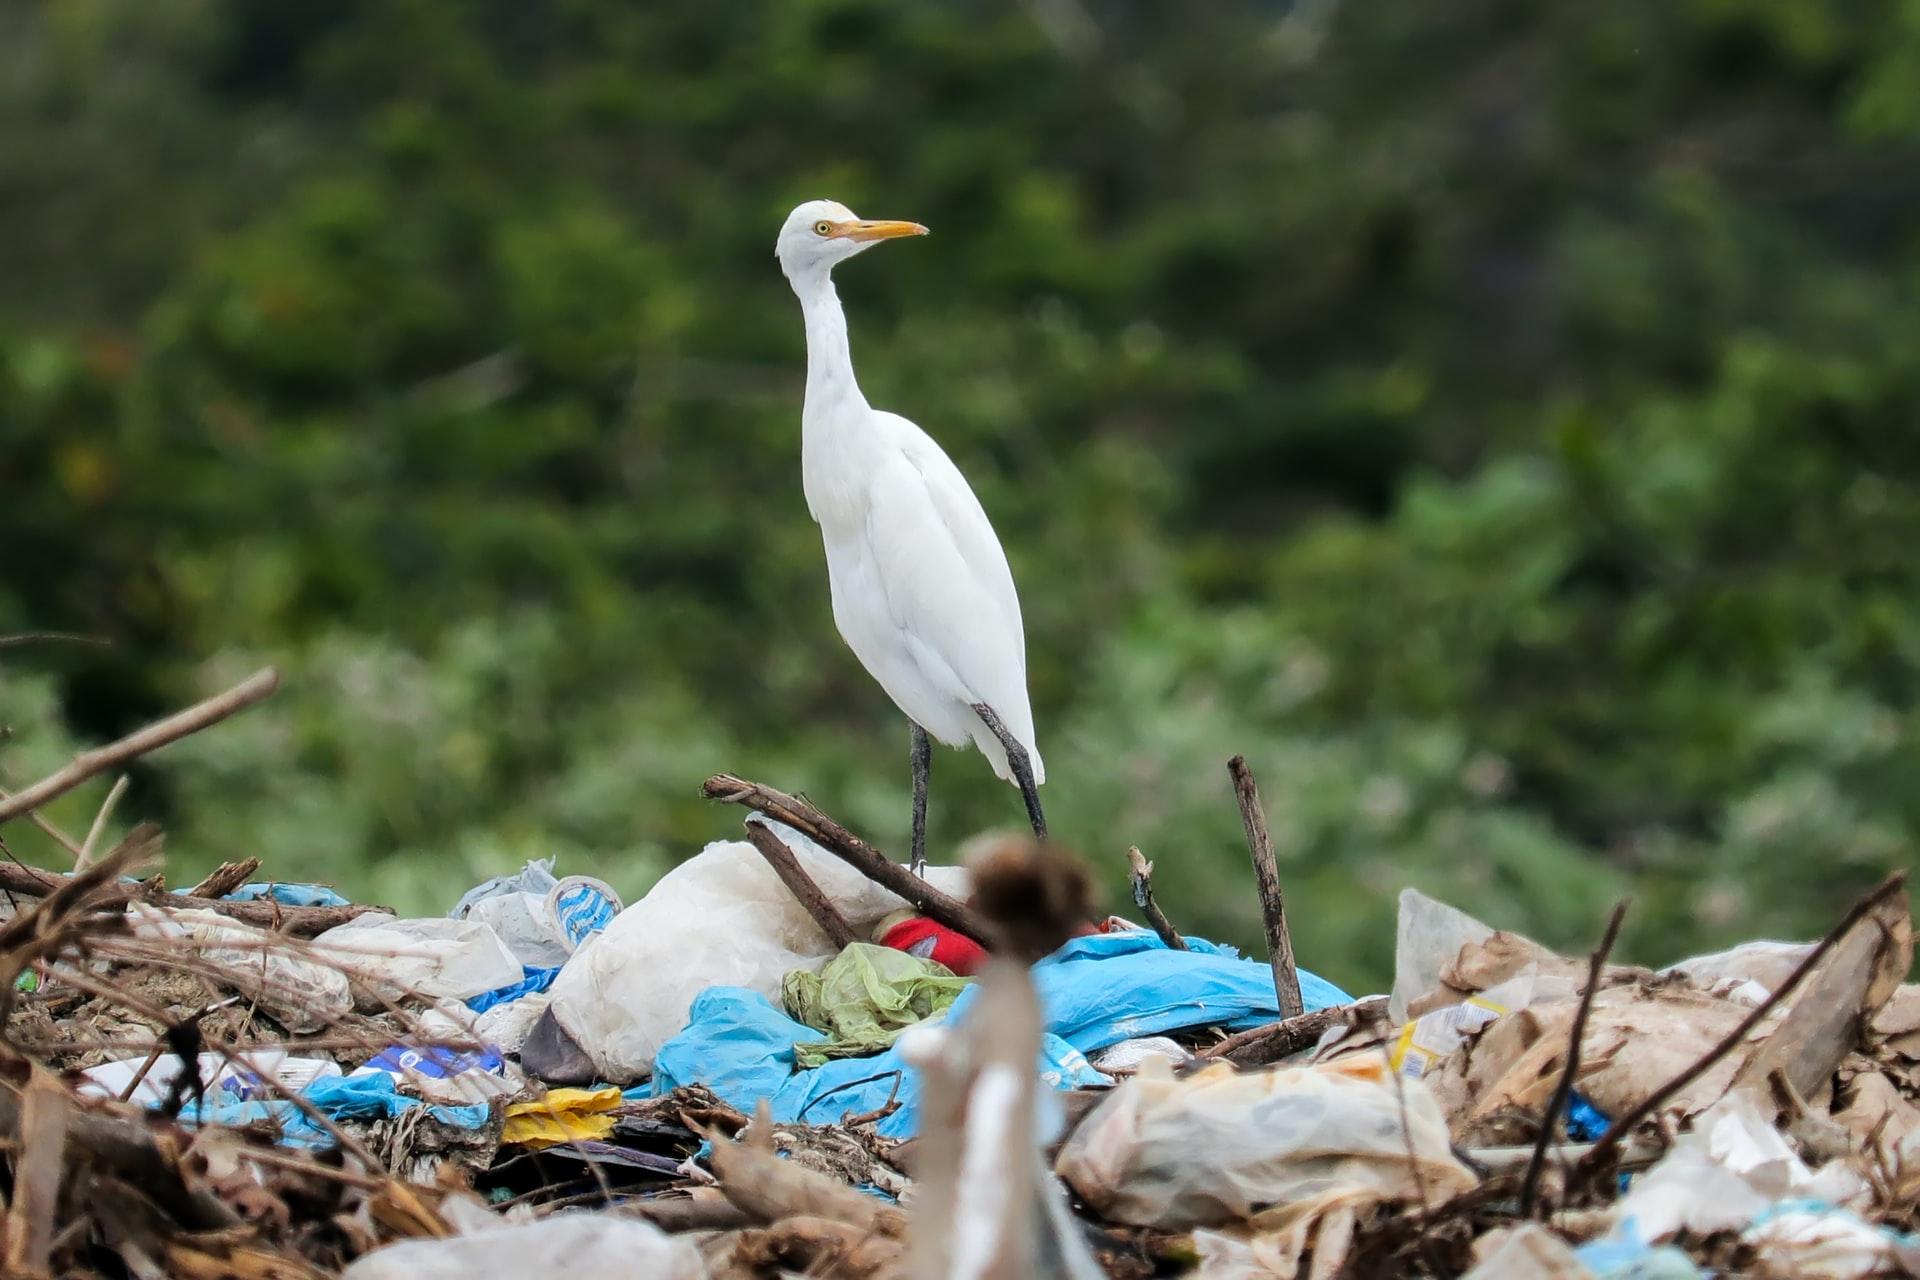 seabirds-need-us-to-cut-out-single-use-plastics